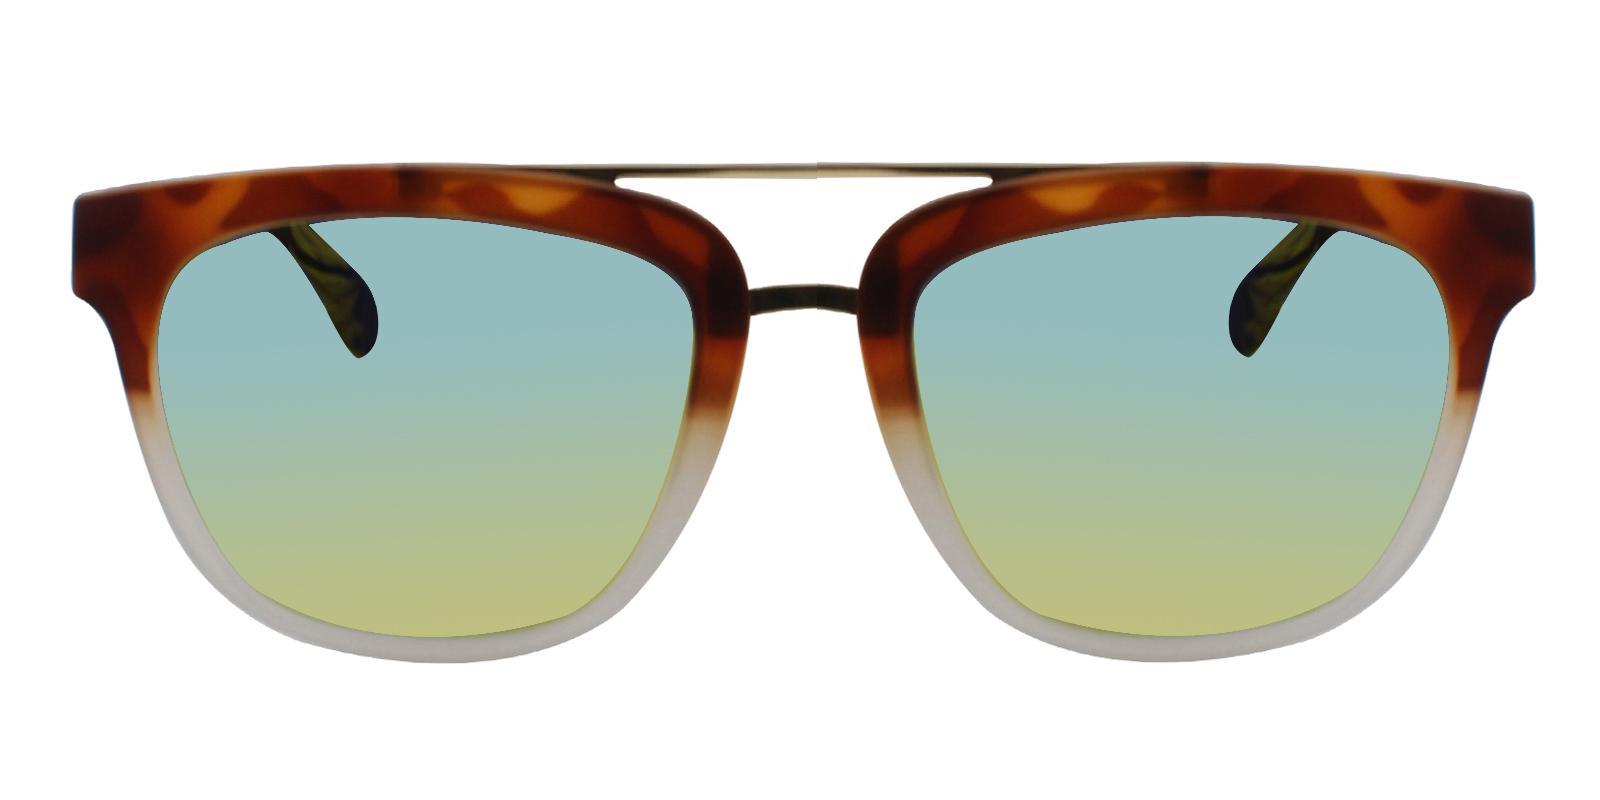 Charlotte Leopard TR Sunglasses , UniversalBridgeFit Frames from ABBE Glasses